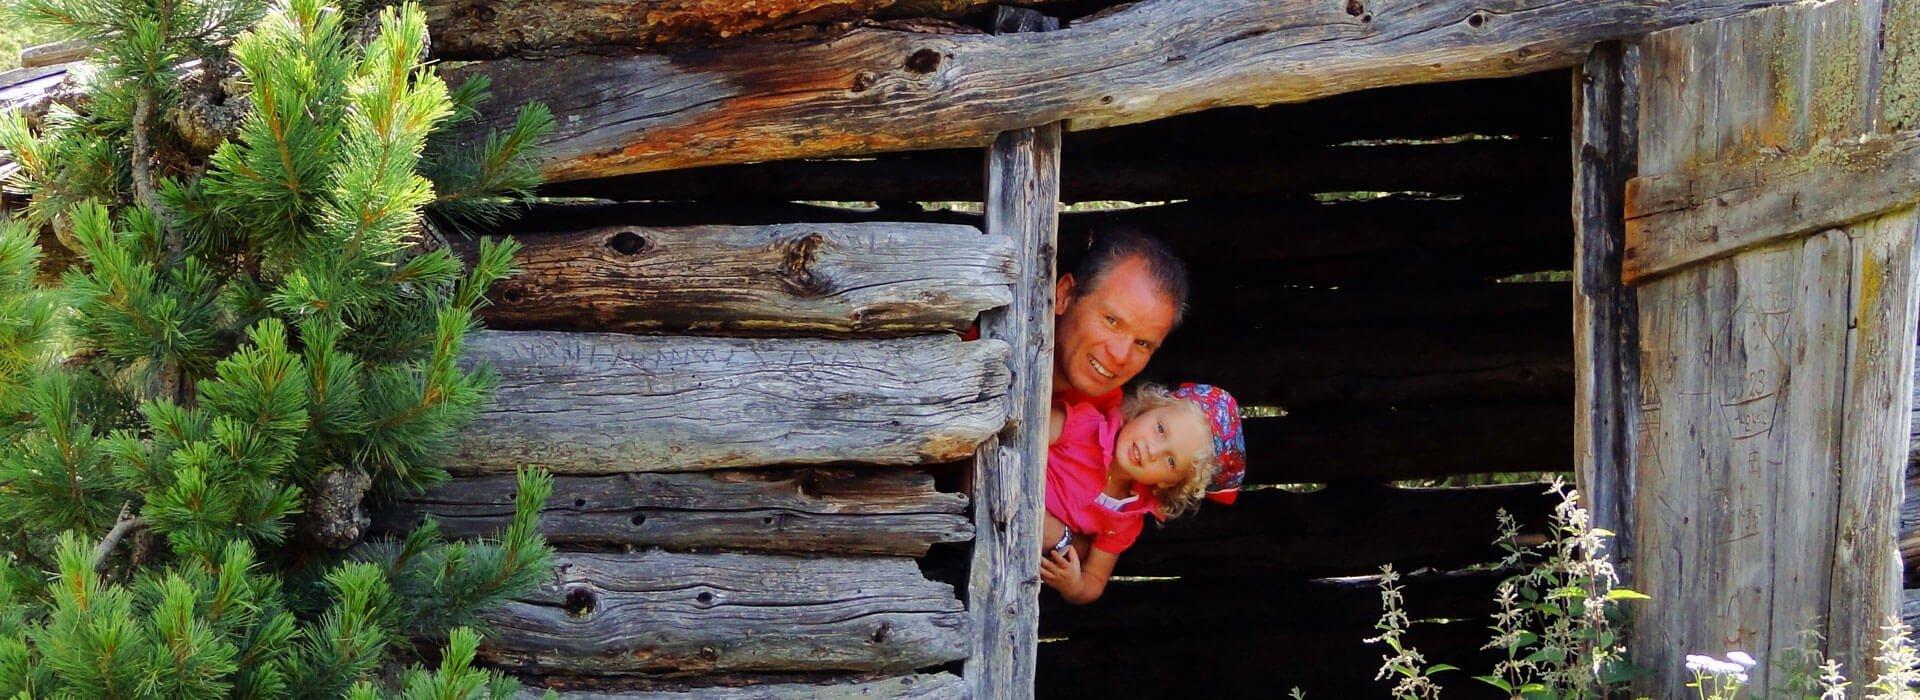 kinderbauernhof-kinderferien